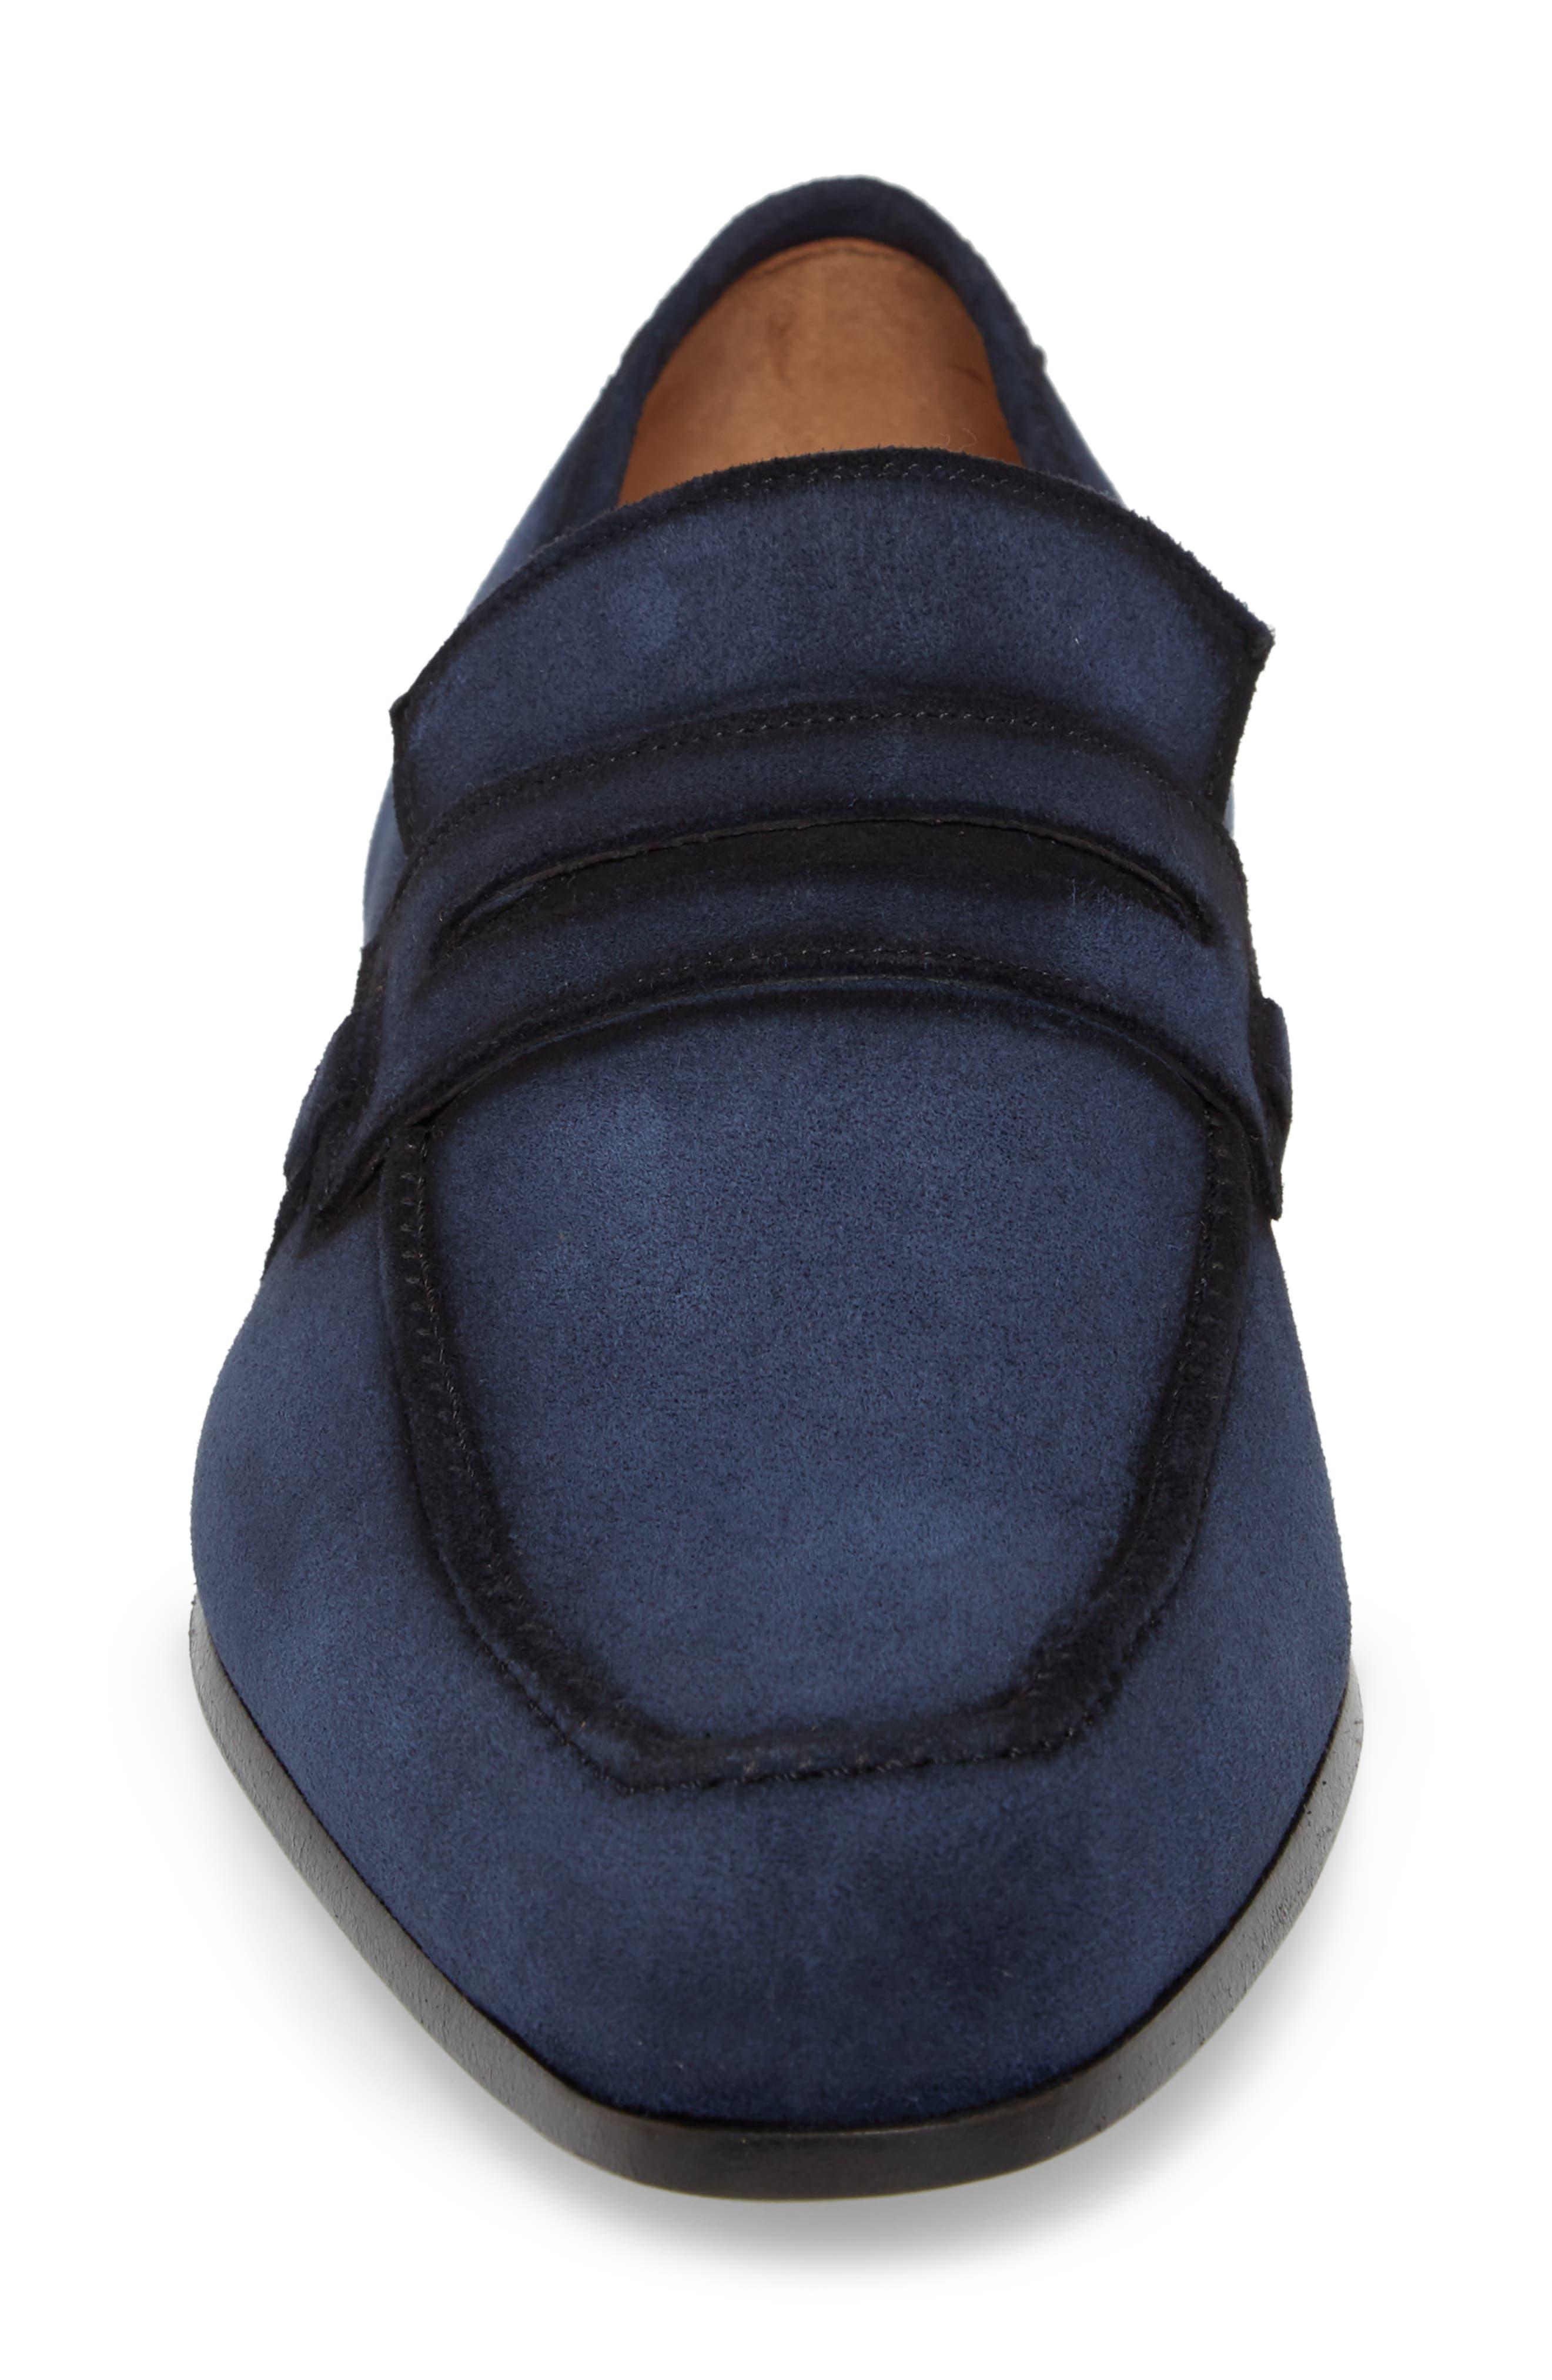 Ulpio Apron Toe Penny Loafer,                             Alternate thumbnail 4, color,                             Blue